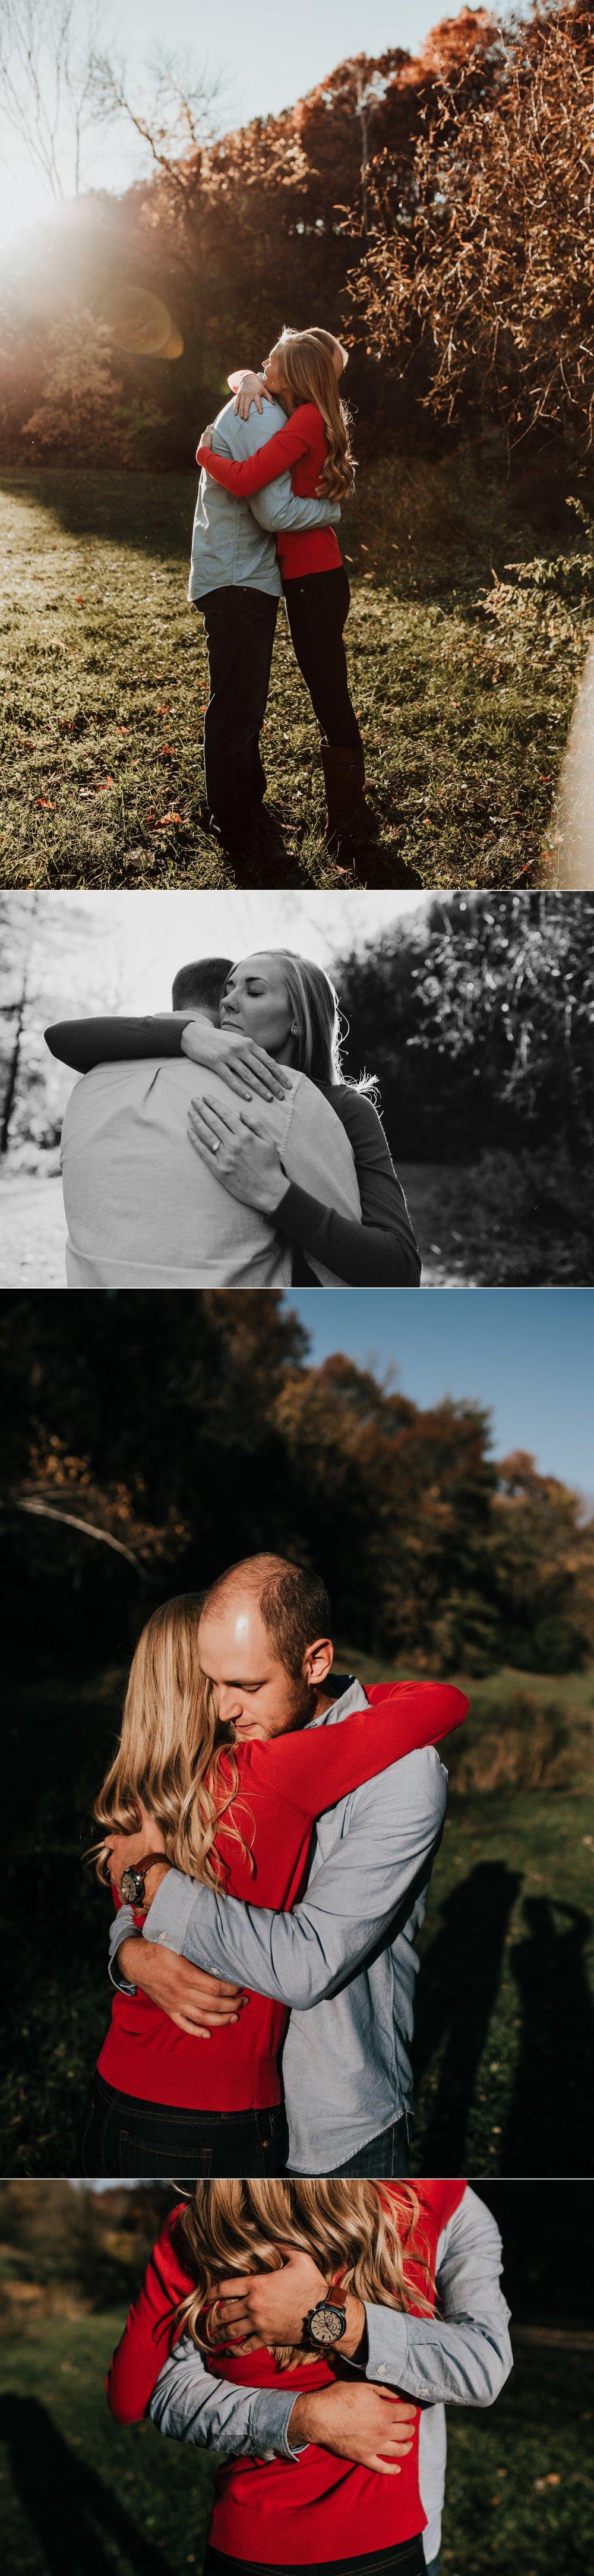 caroline and taylor minneapolis minnesota texas austin dallas houston wedding elopement destination intimate adventurous couple best photographer_0020.jpg